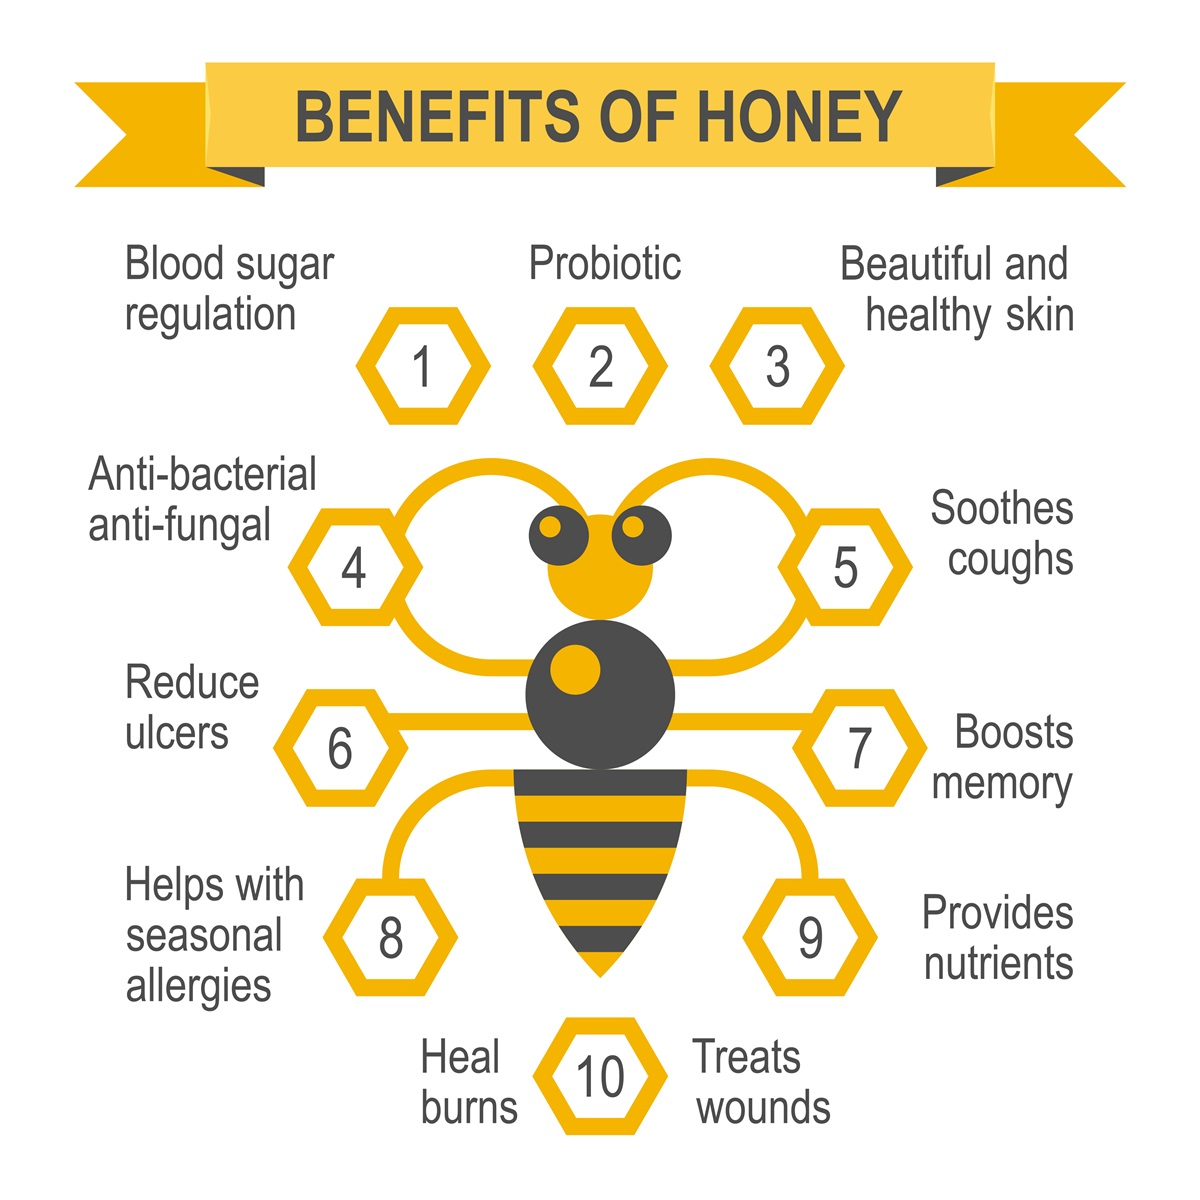 Health benefits of manuka honey 30 dating. Health benefits of manuka honey 30 dating.